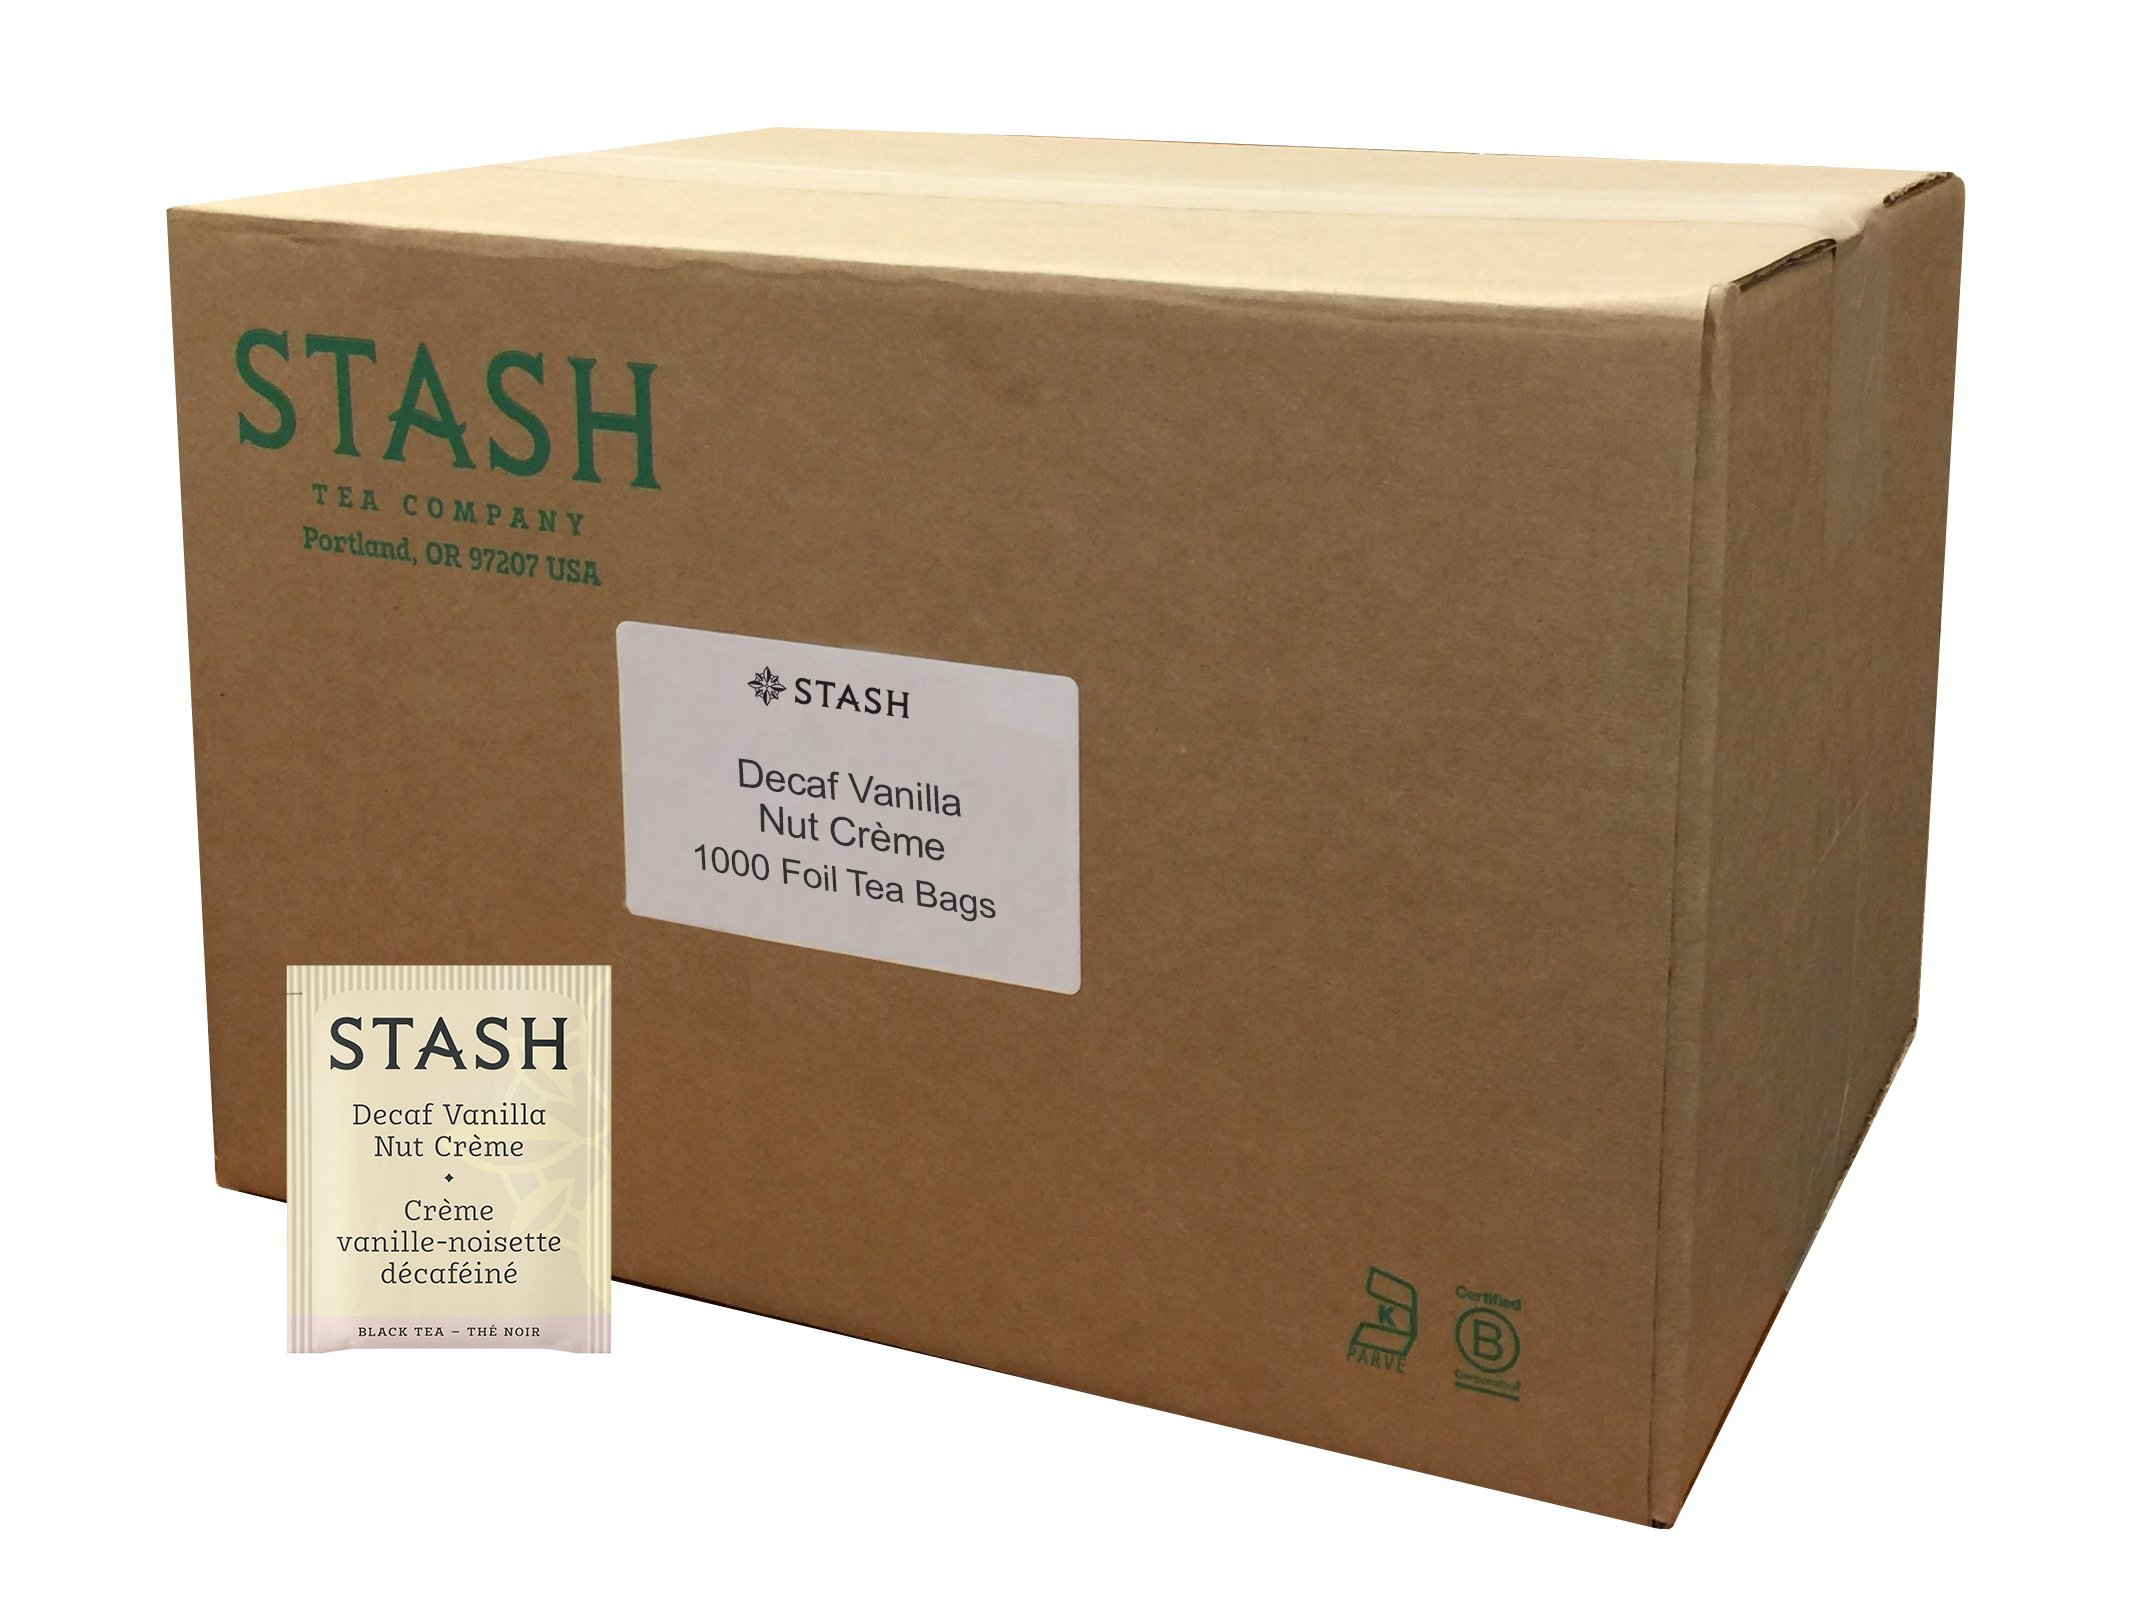 CDM product Stash Tea Decaf Vanilla Nut Creme Black Tea 1000 Tea Bags in Foil (Packaging May Vary) Individual Decaffeinated Black Tea Bags for Use in Teapots Mugs or Cups, Brew Hot Tea or Iced Tea big image